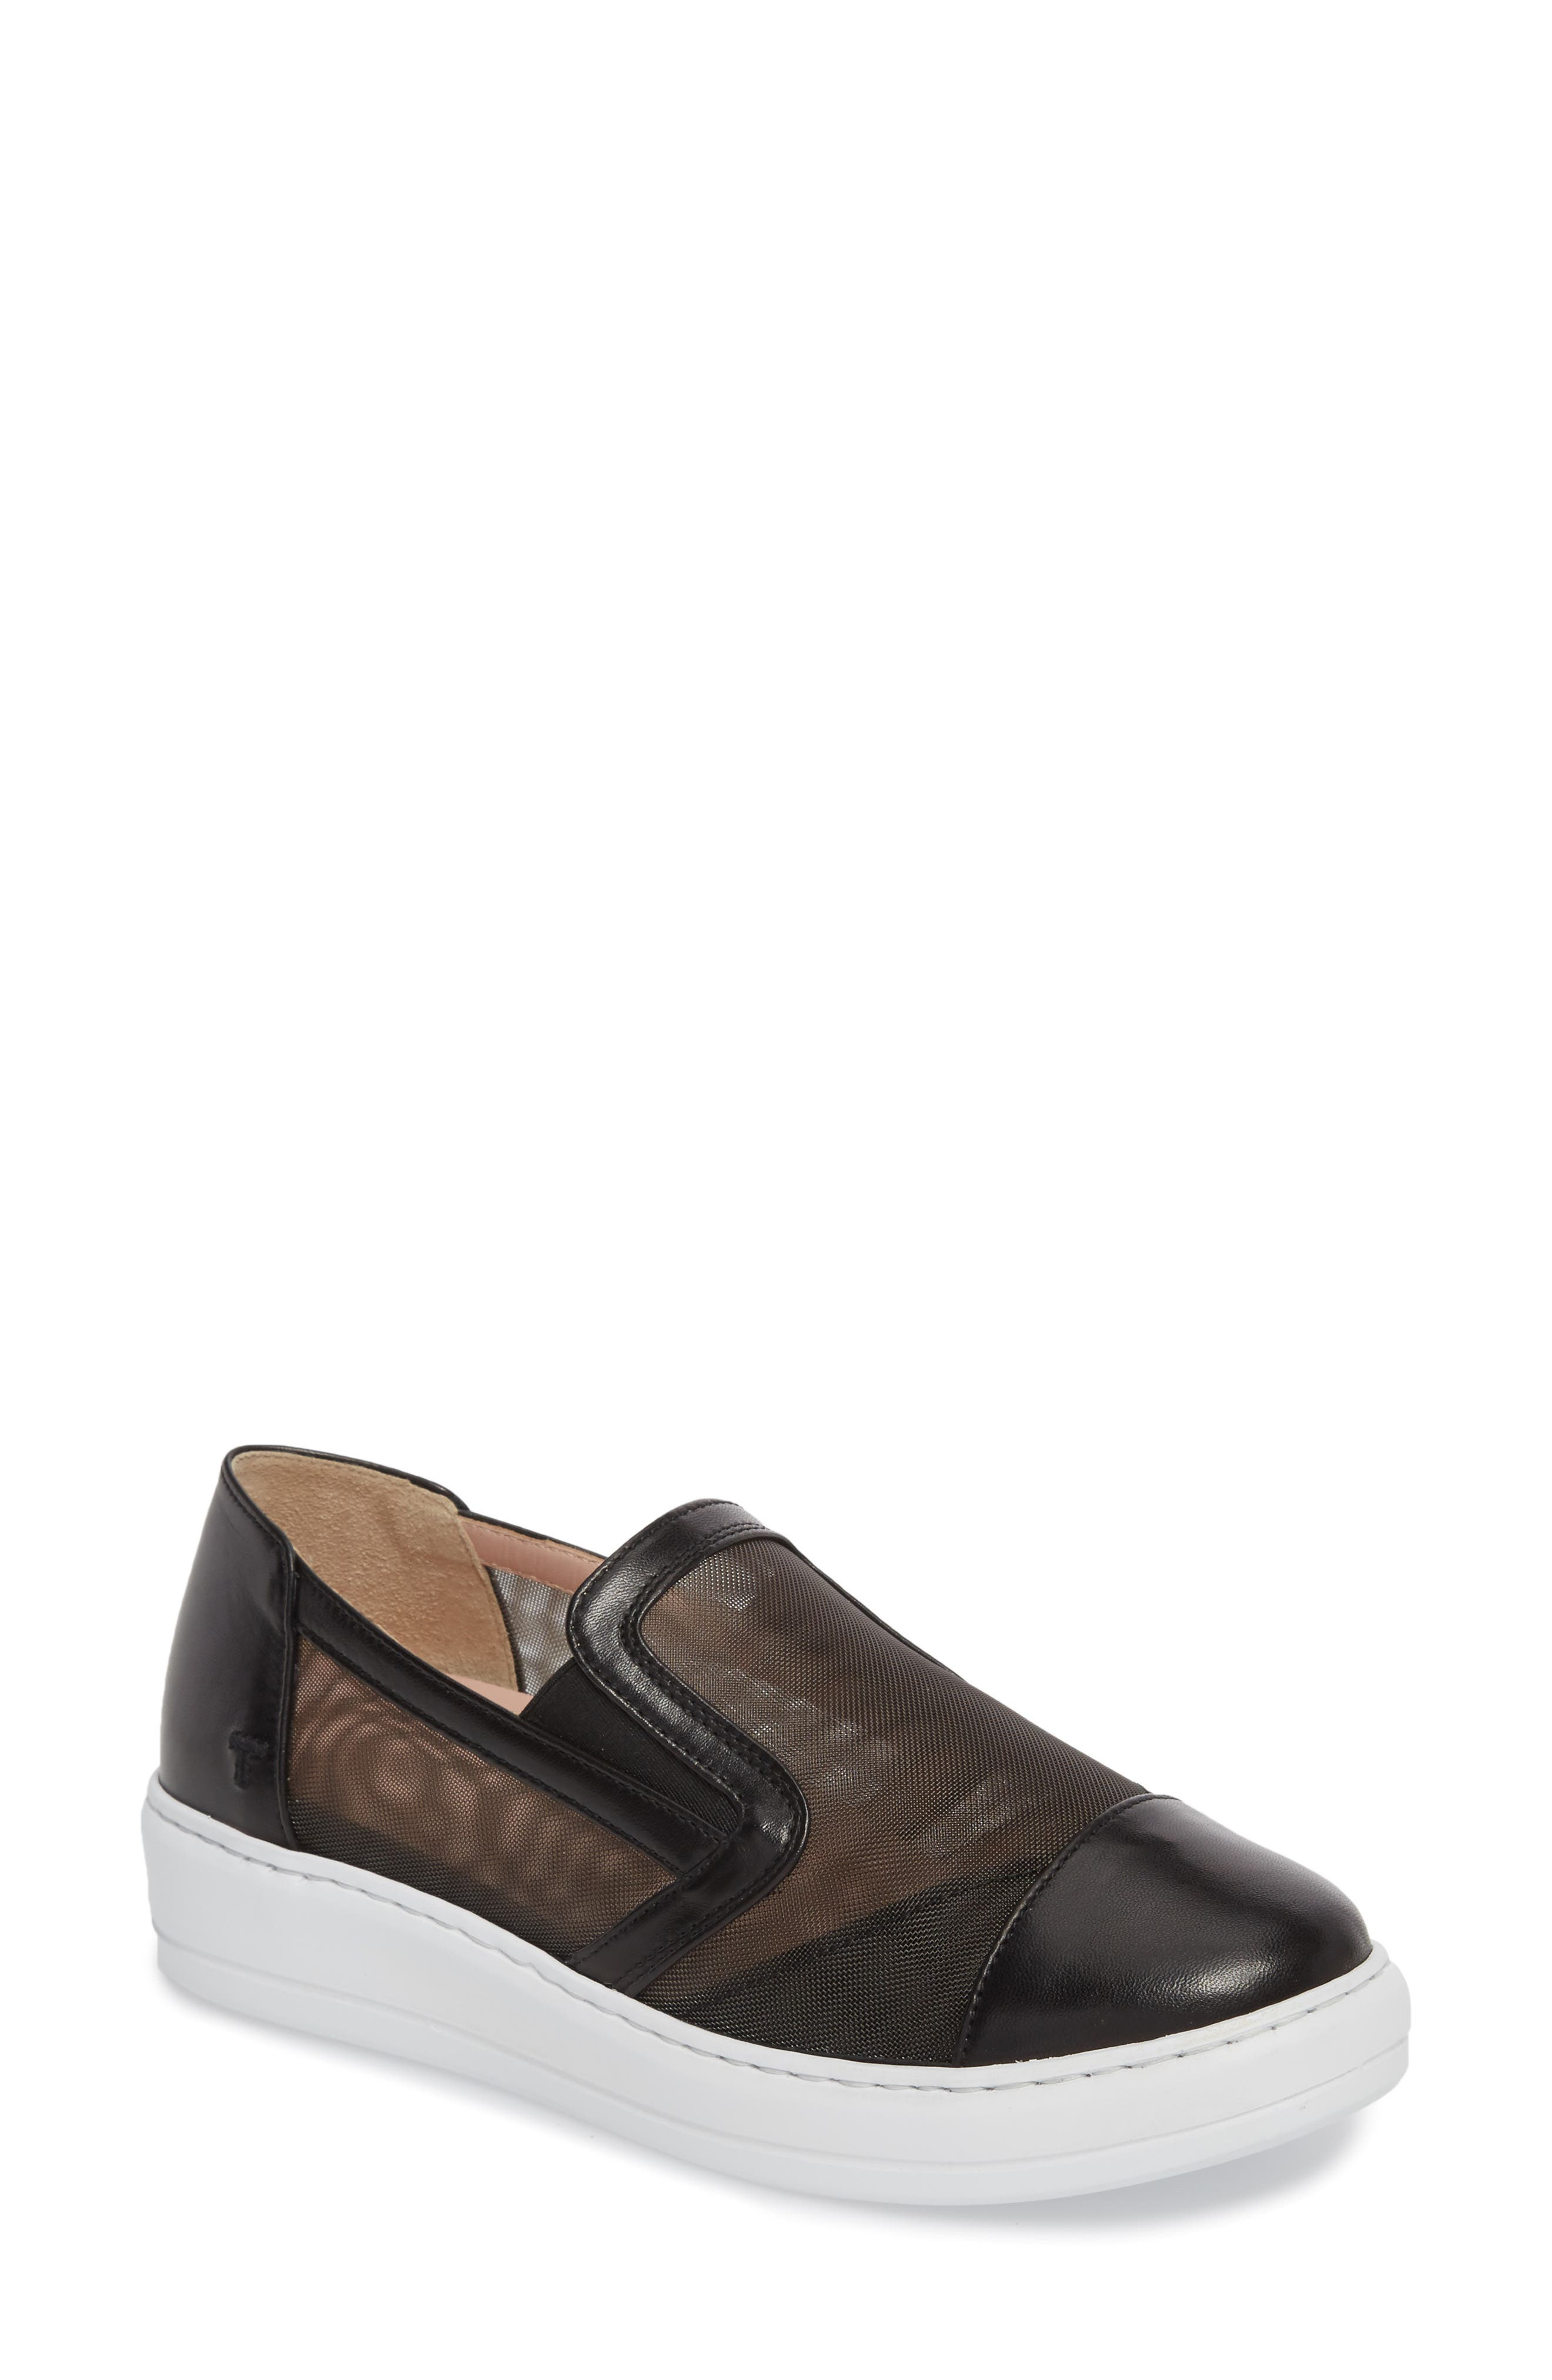 Taryn Rose Calandra Slip-On Sneaker,                         Main,                         color, 004